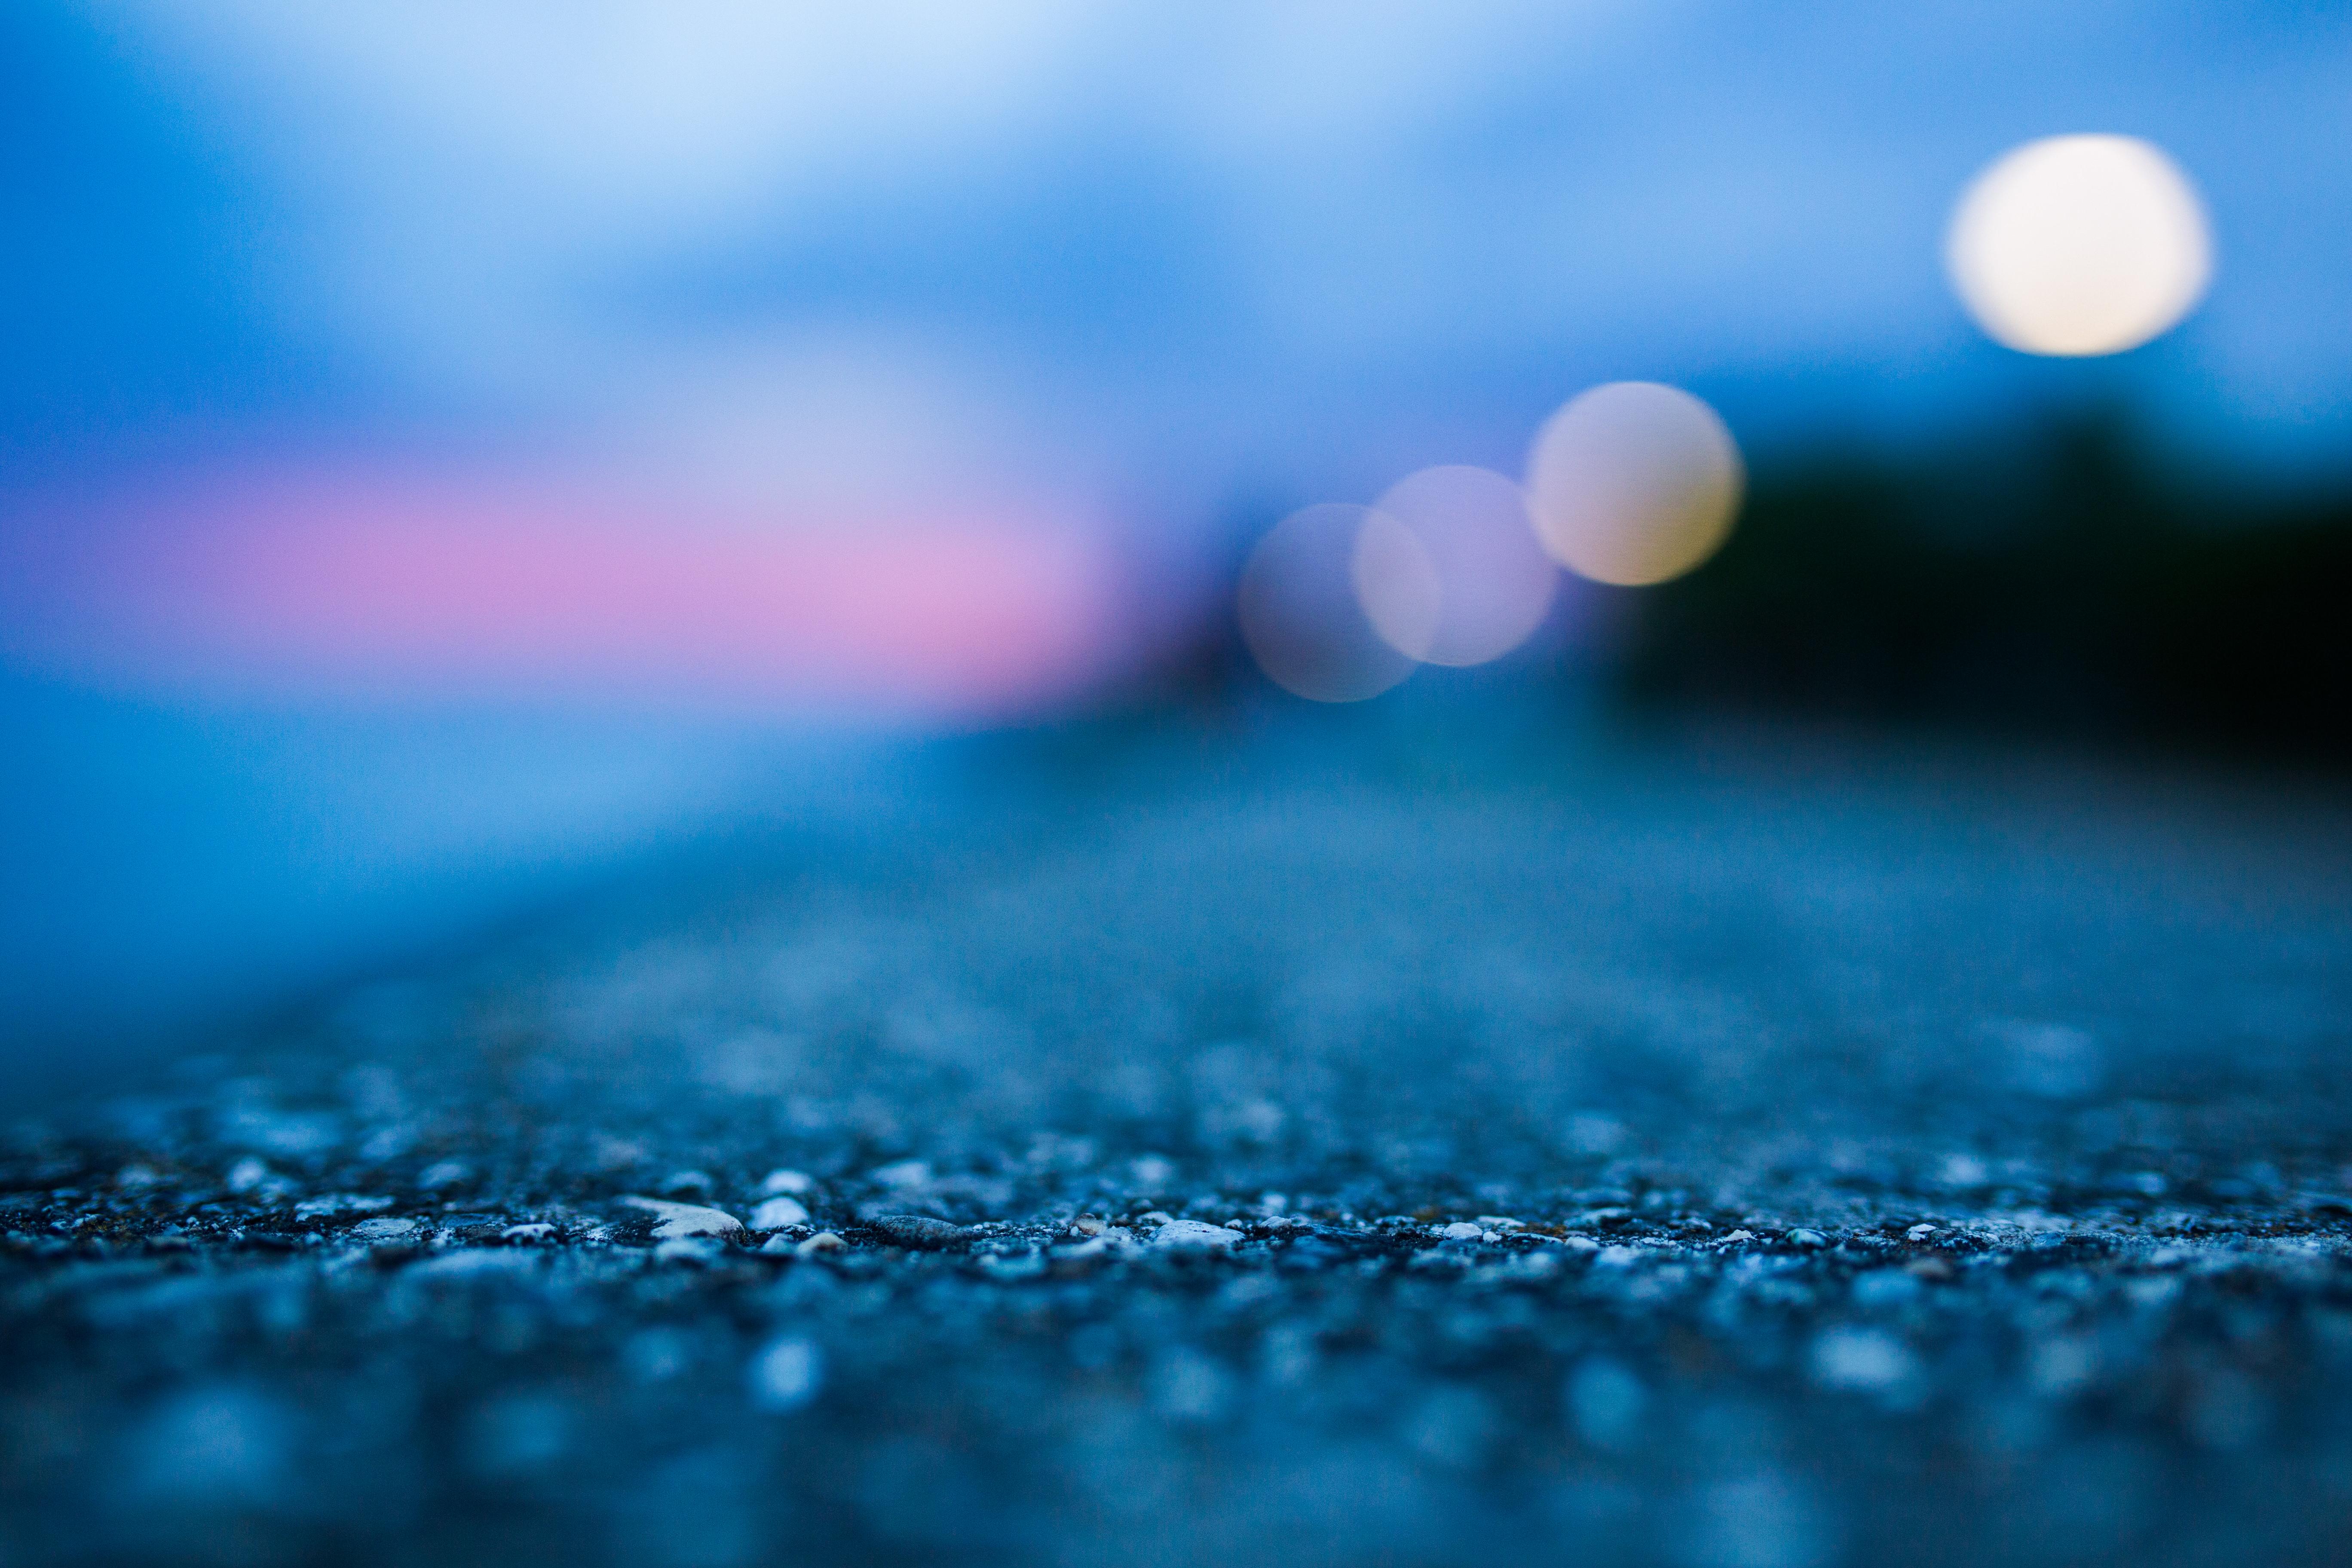 Close-up of concrete, asphalt, blue, light, morning, blurred, bokeh, concrete, lake, raining, rocks, storm, Sun, sunset, view.